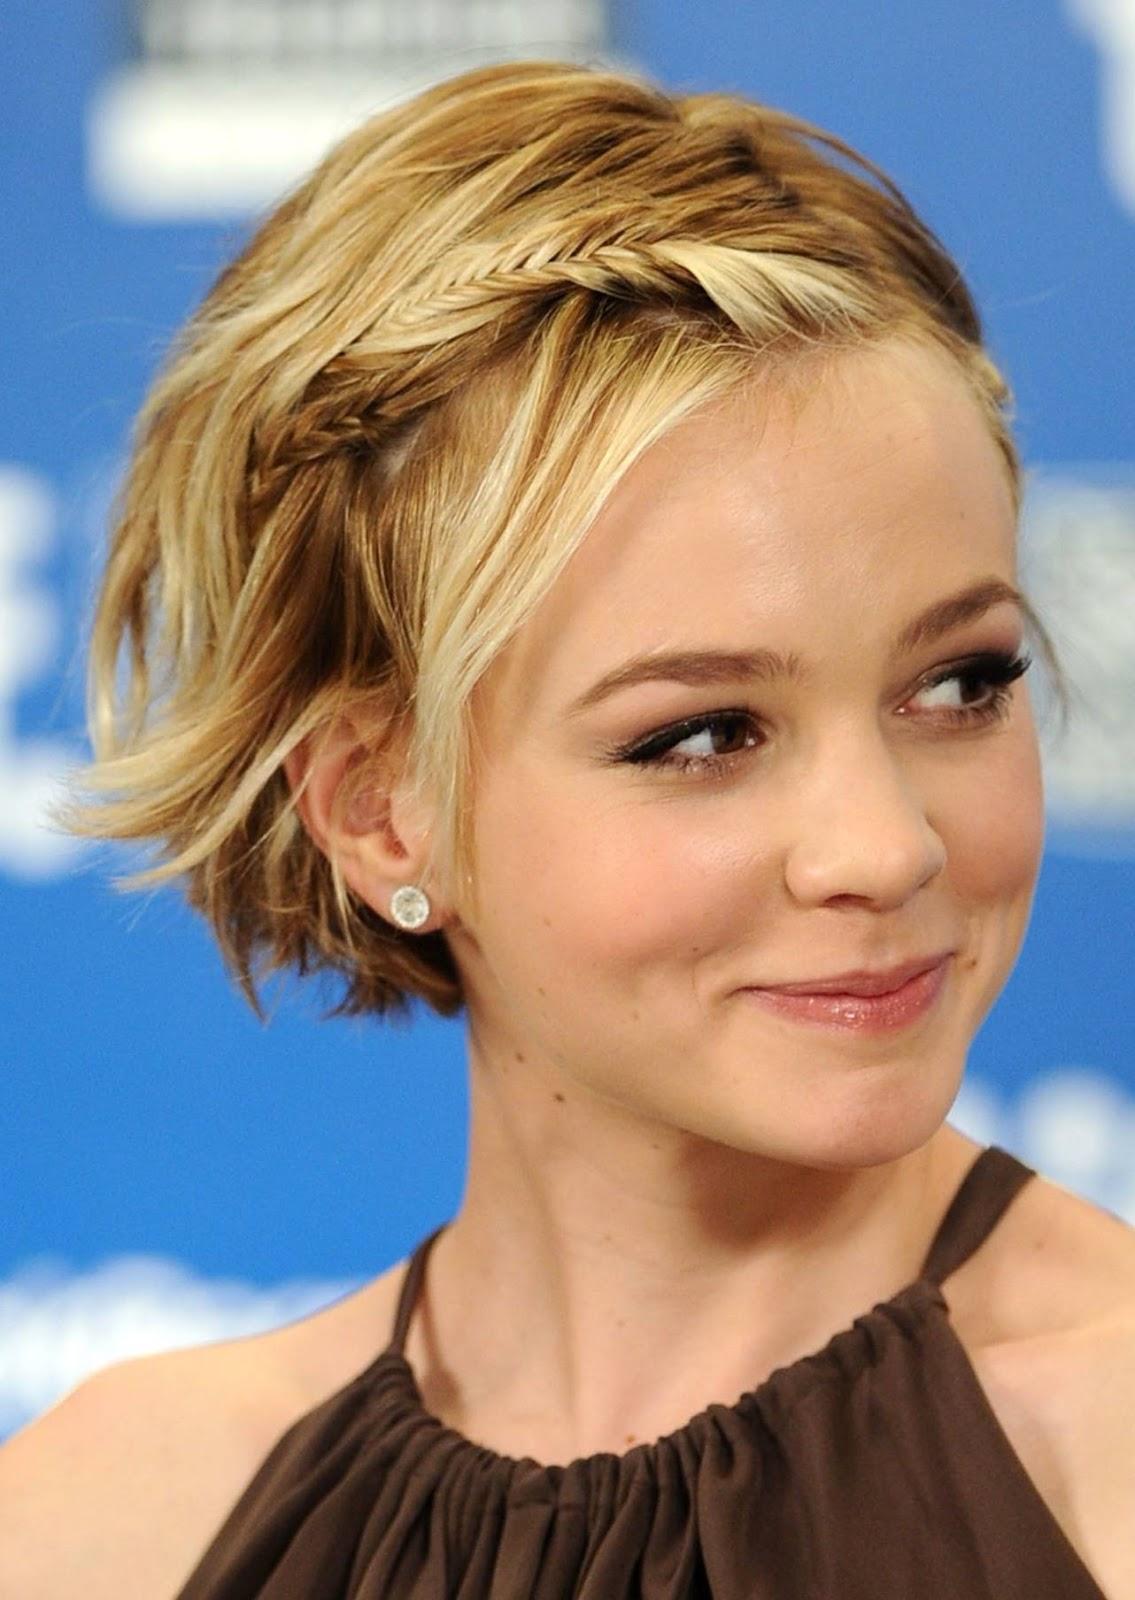 Short Hairstyles Short Blonde Hairstyles